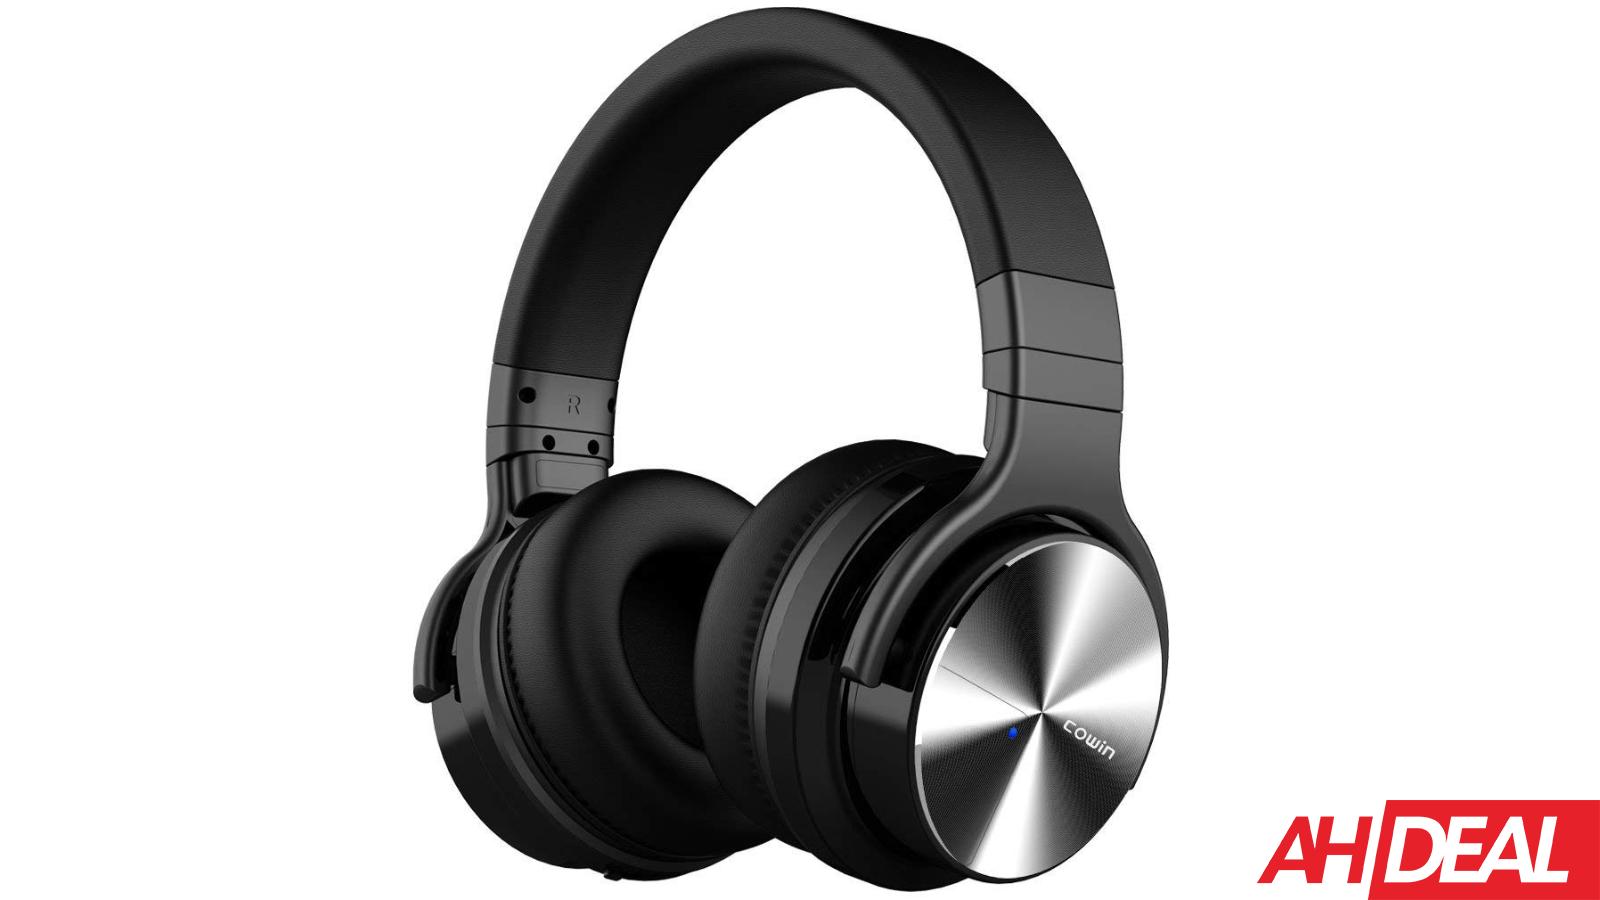 46060 COWIN E7 Pro Wireless Headphones $61 - Amazon Year-End Deals 2018